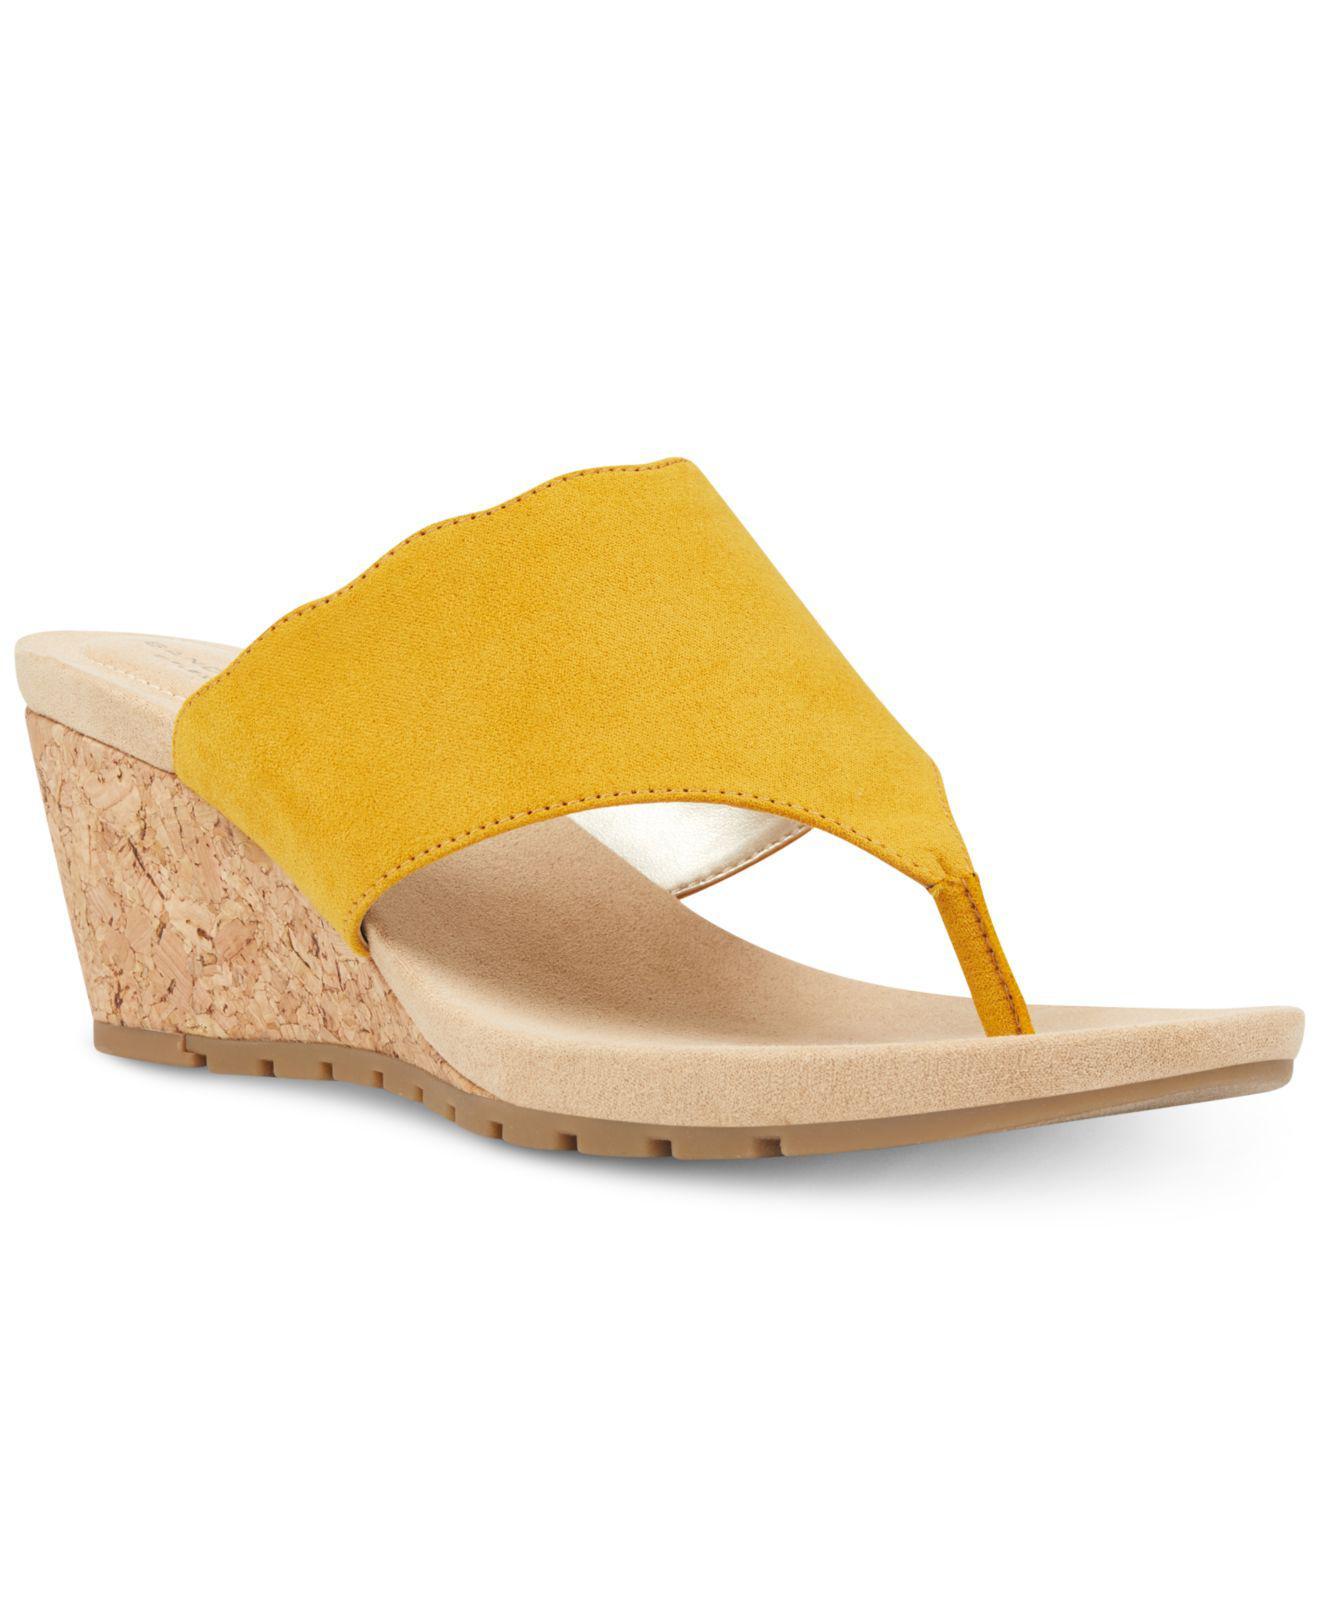 746e918452b5c6 Lyst - Bandolino Sarita Slip-on Wedge Sandals in Yellow